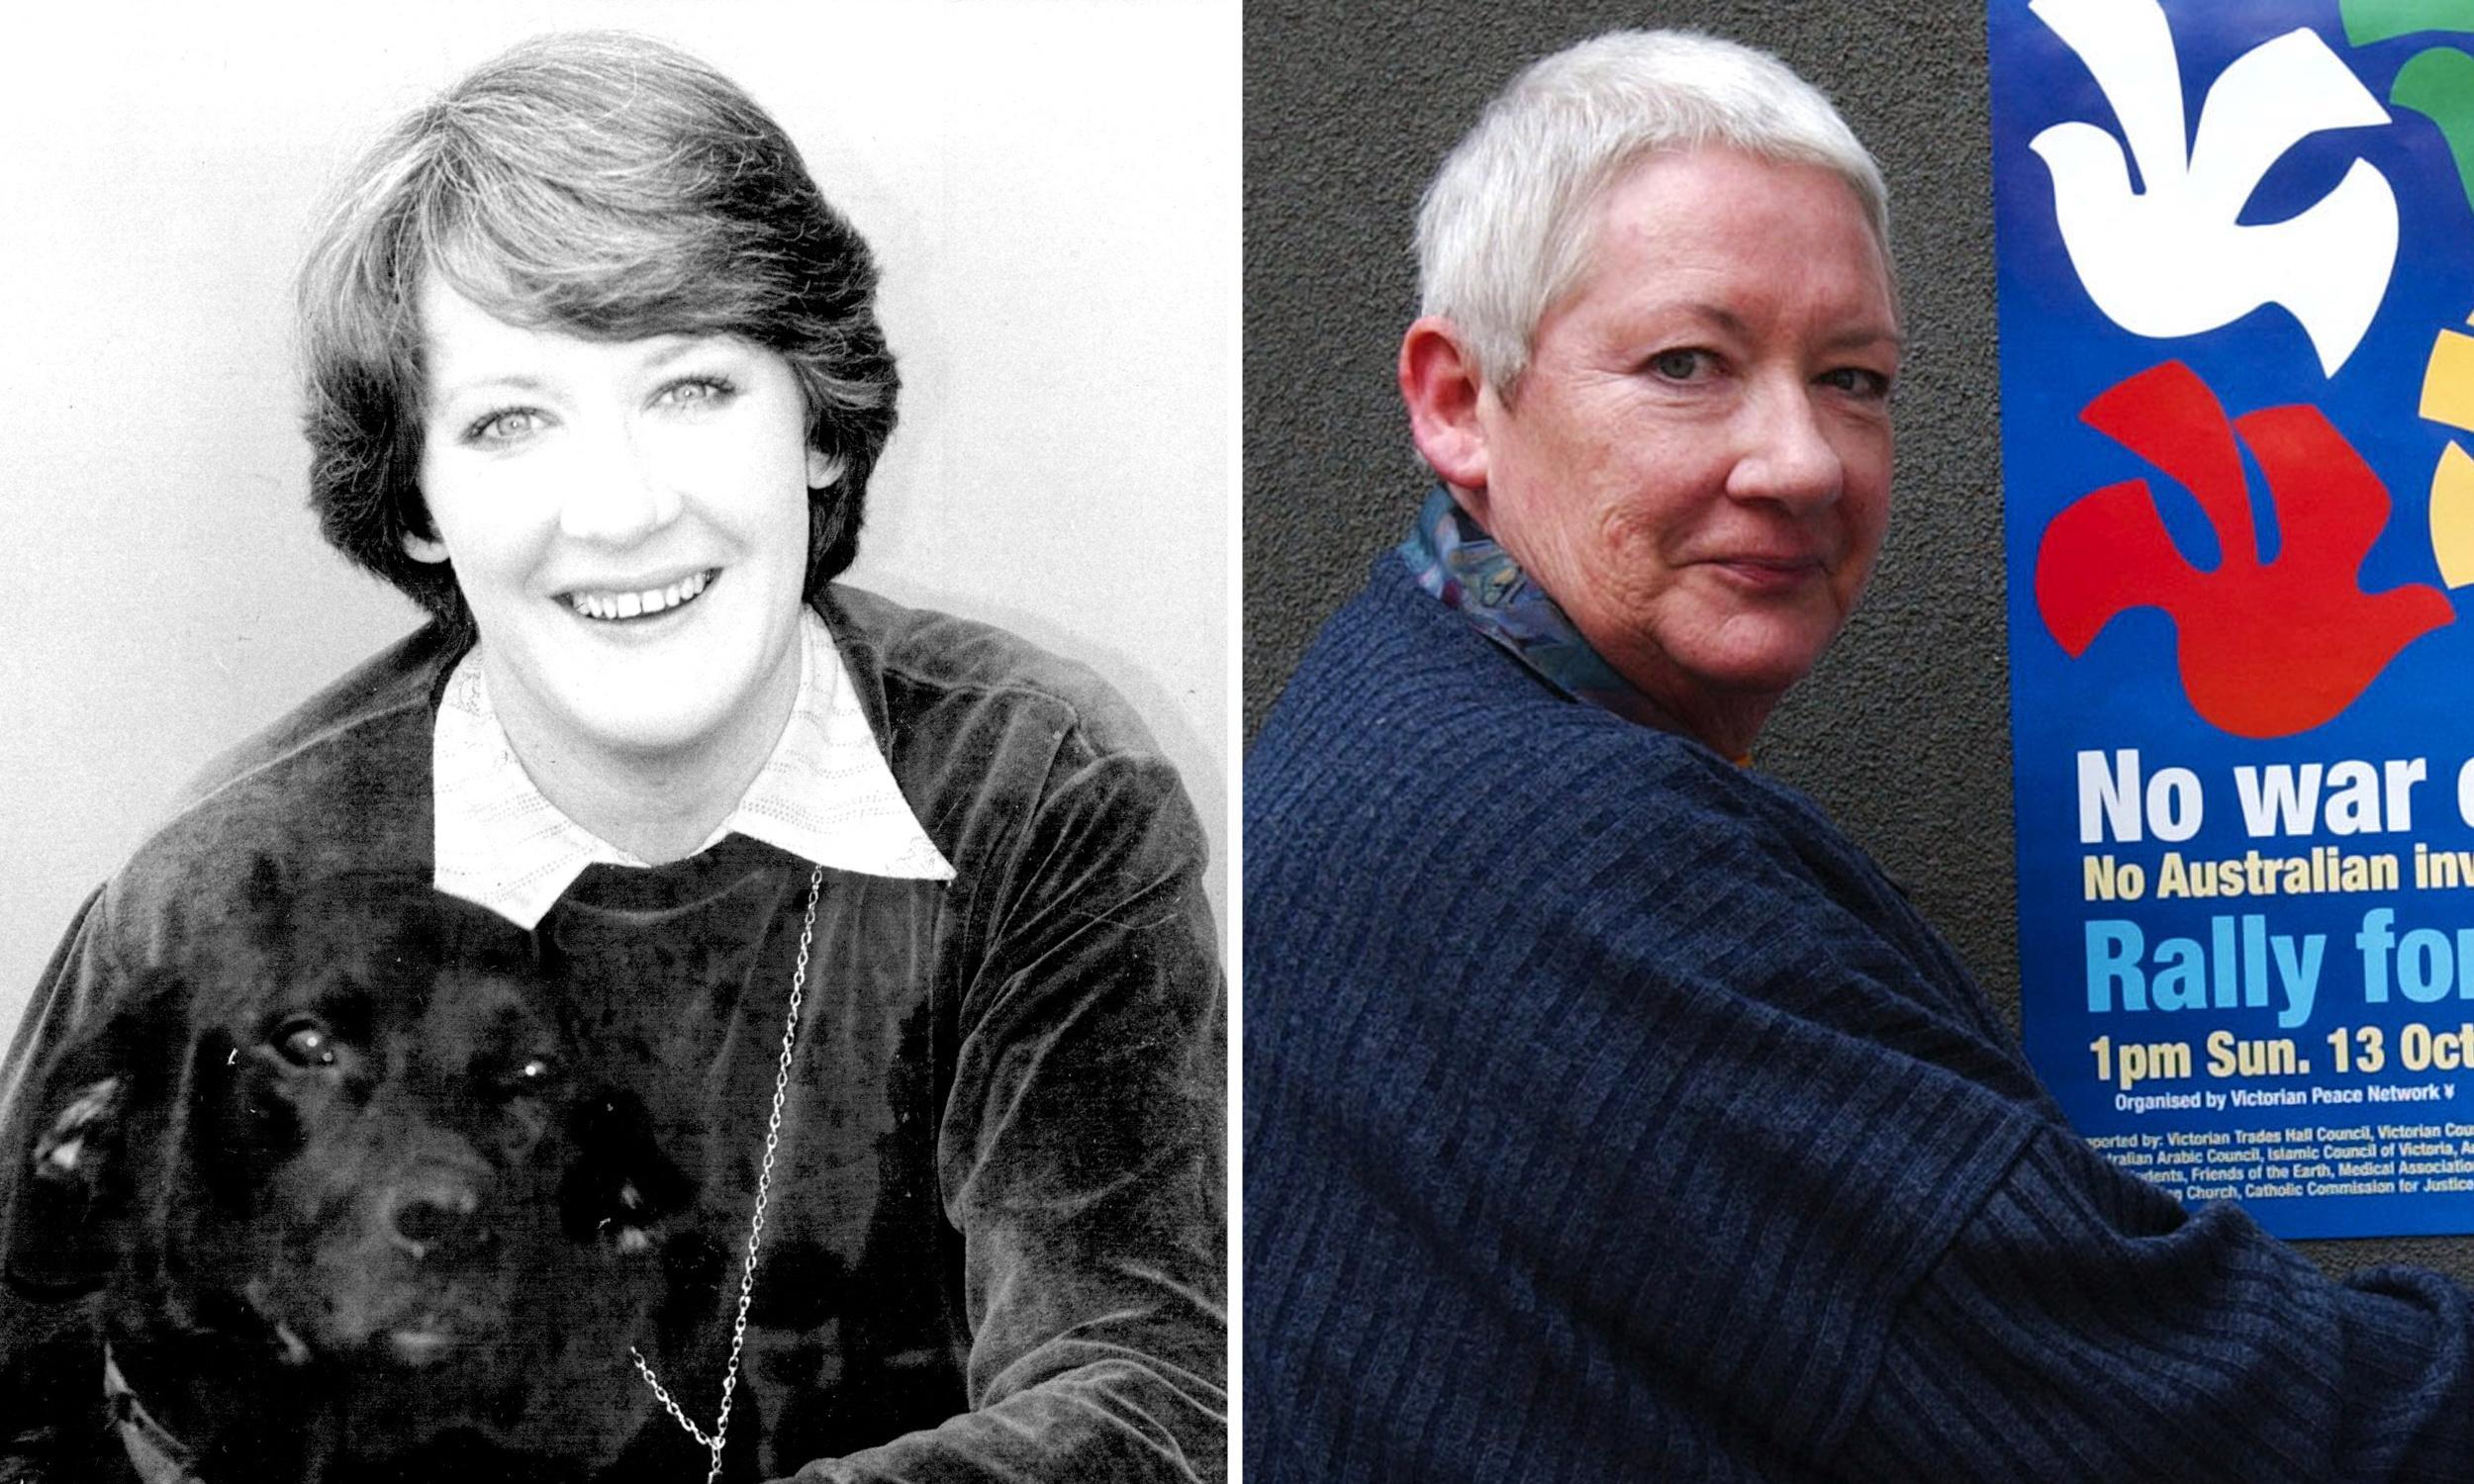 Anne Phelan, Australian actor best known as star of Prisoner, dies aged 75